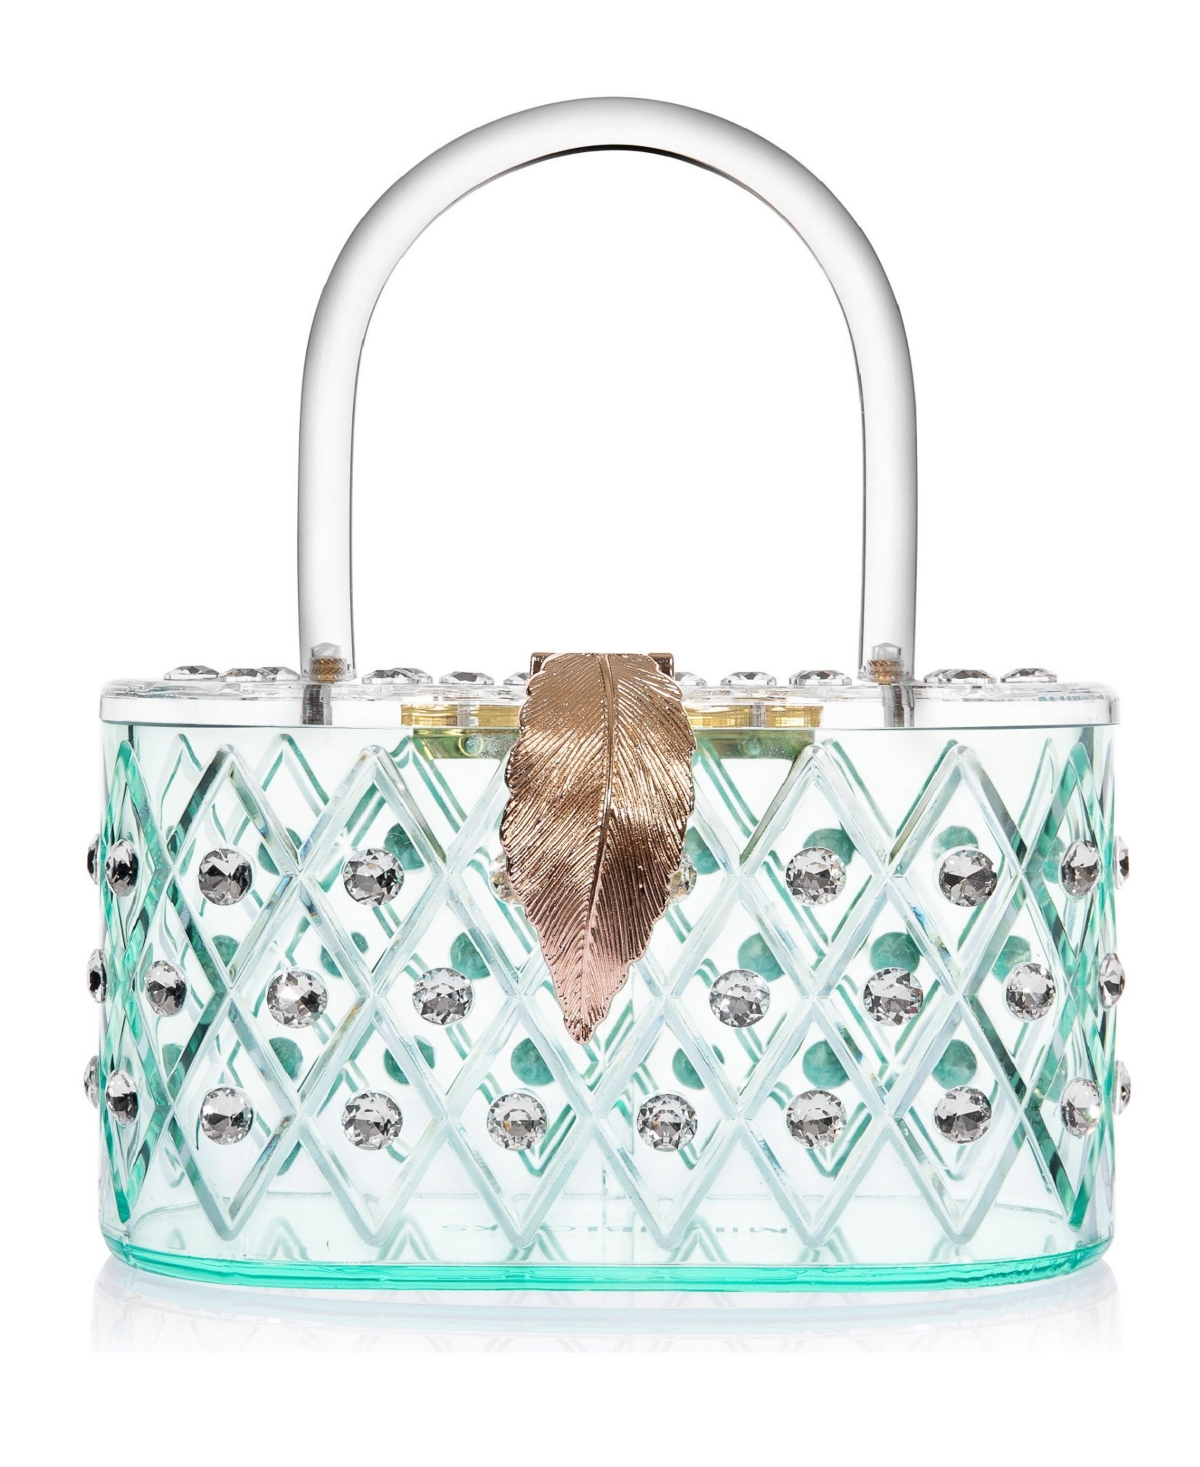 "Milanblocks 1950 Retro Style ""Spearmint Ice"" Crystal Lucite Box Clutch Bag"